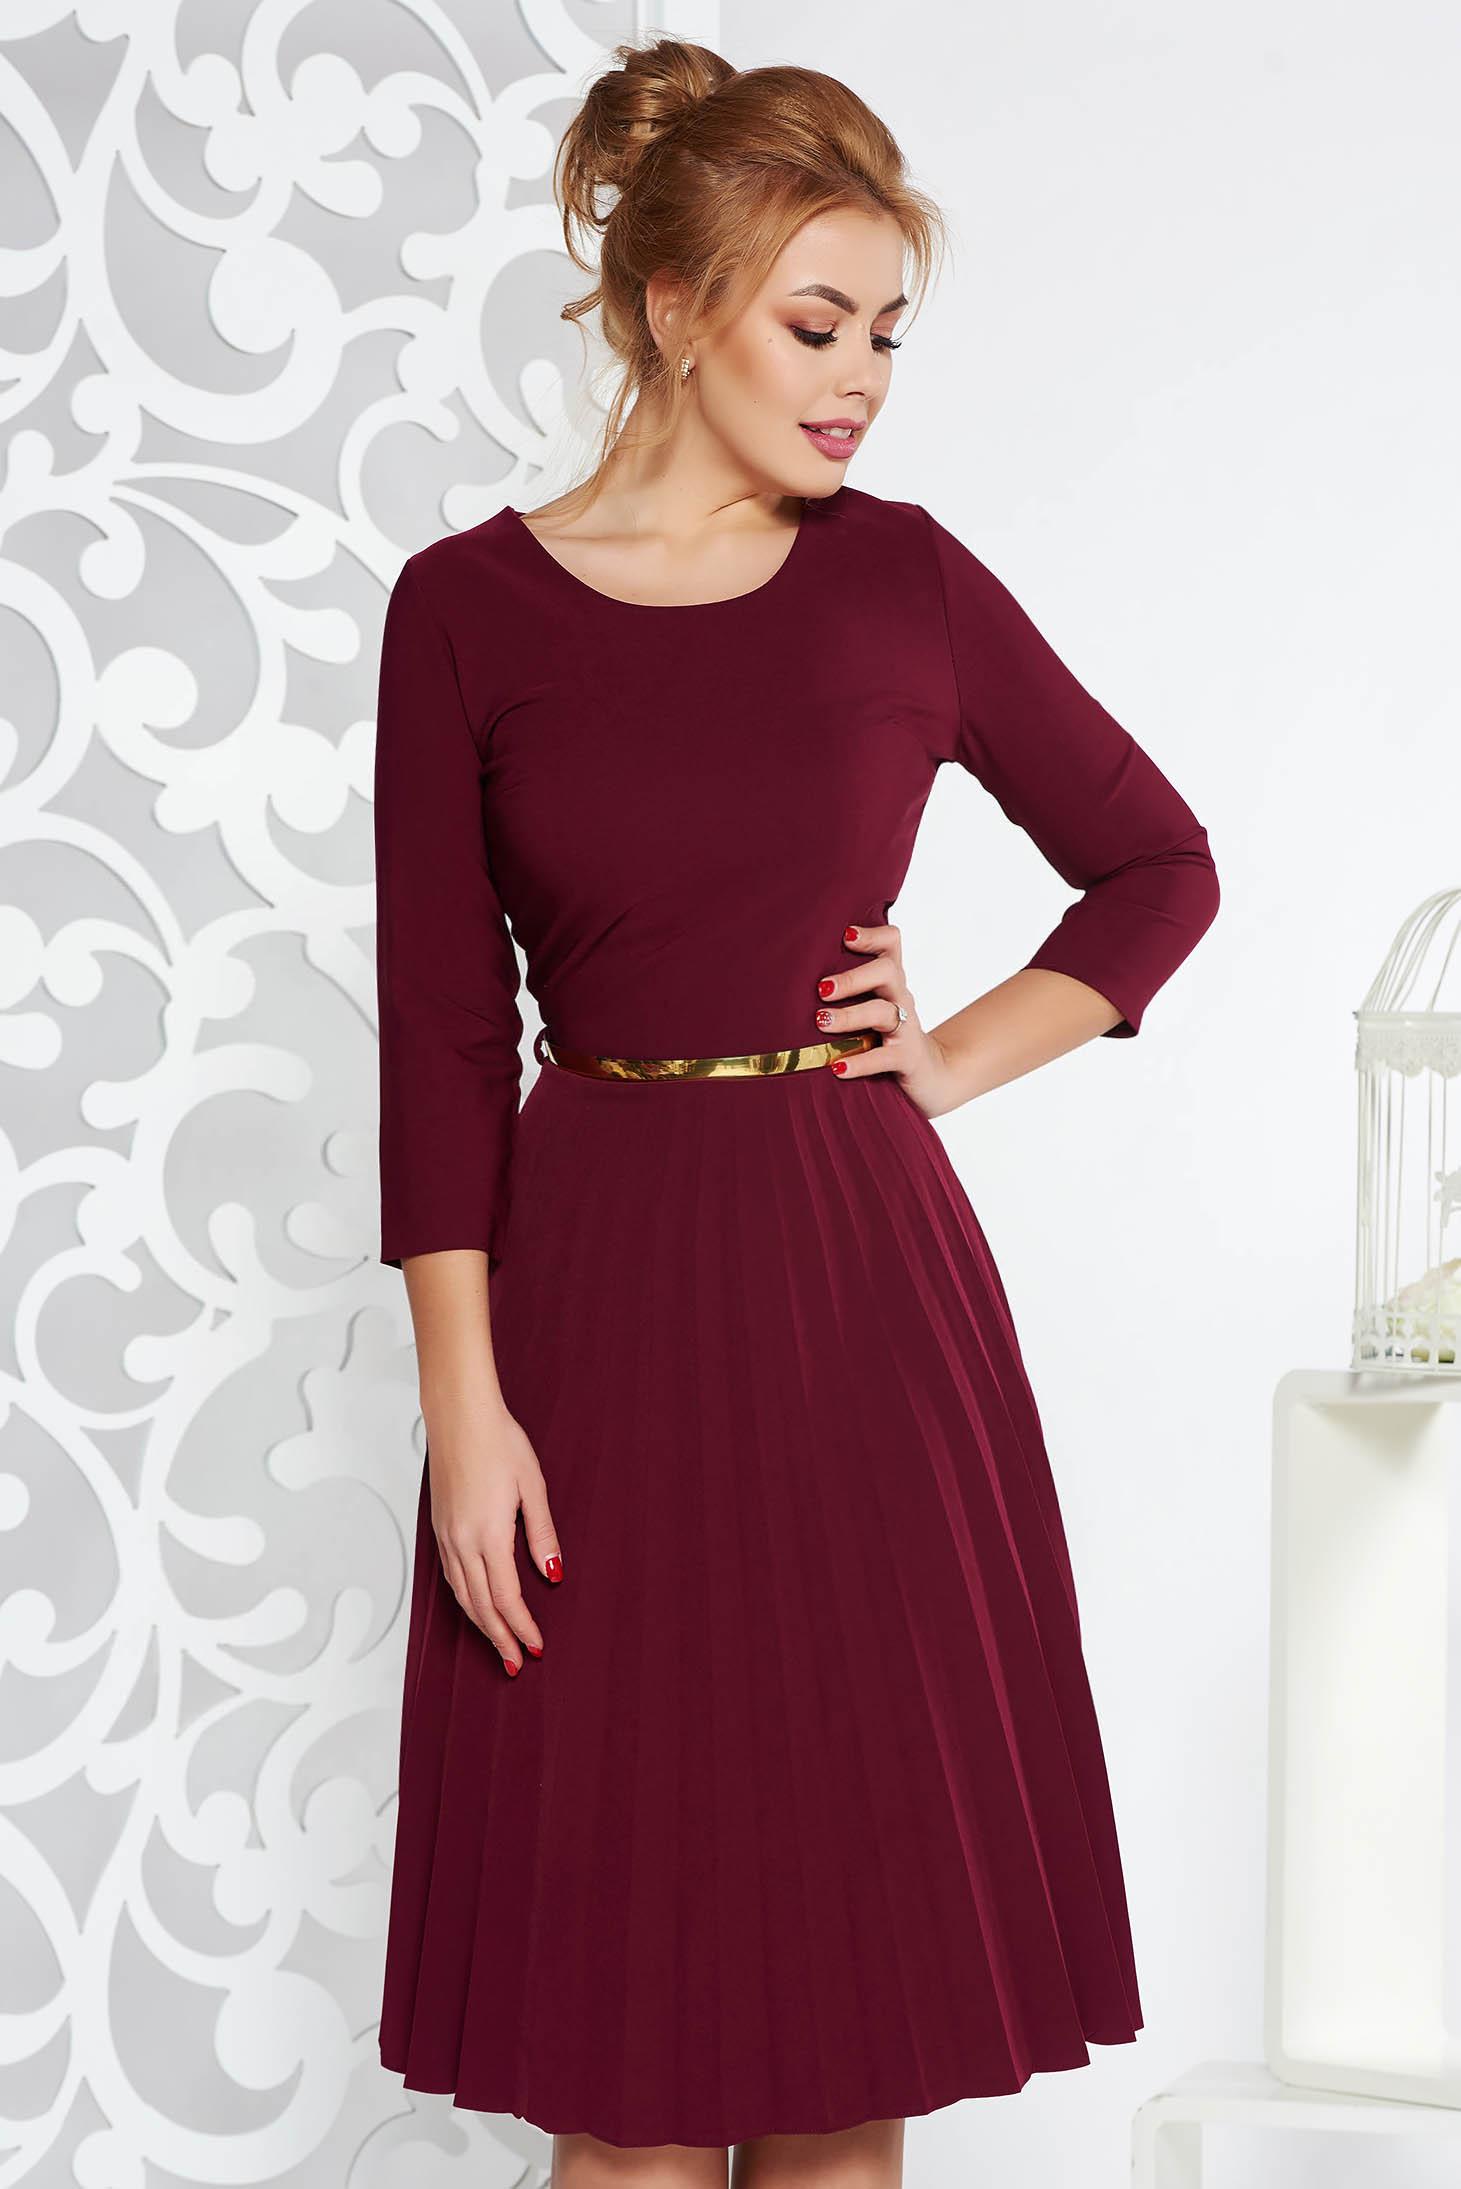 Rochie visinie eleganta in clos plisata cu accesoriu tip curea din stofa elastica subtire